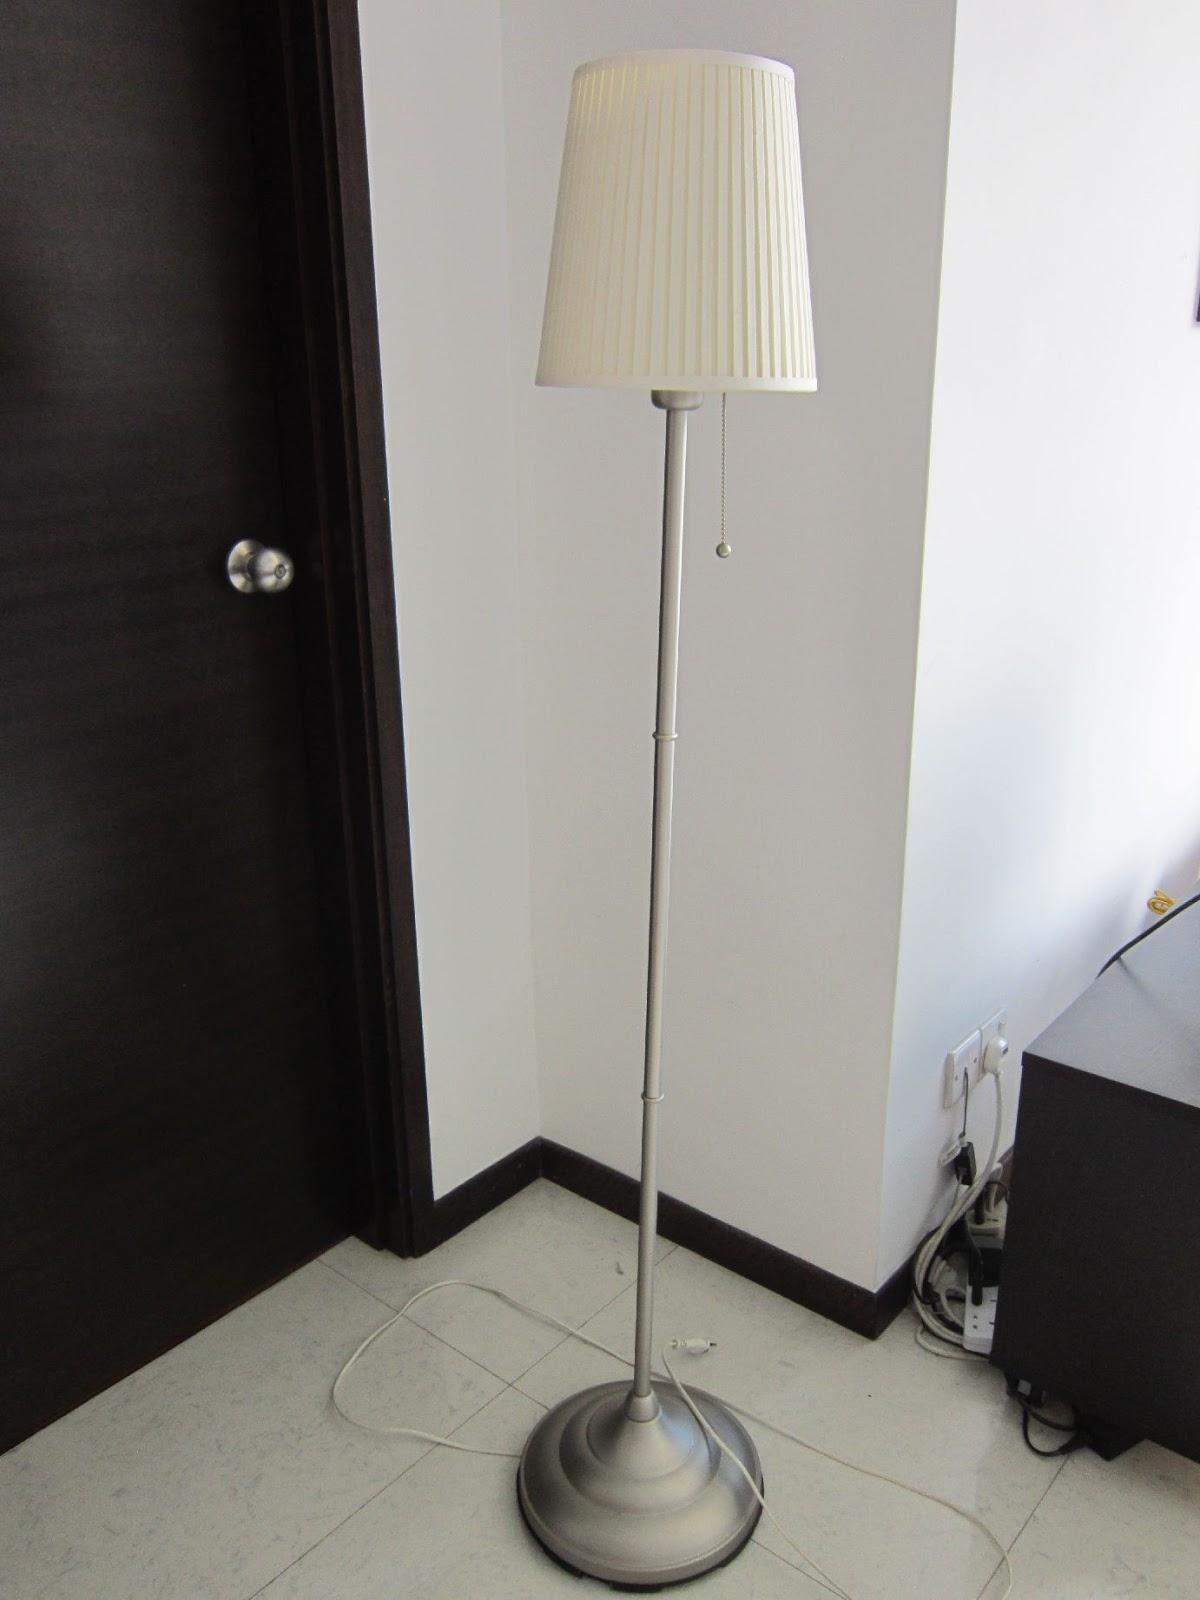 Lava lamp ikea - Arstid Ikea Floor Lamp 35 Reserved Pieces For The Home Arstid Ikea